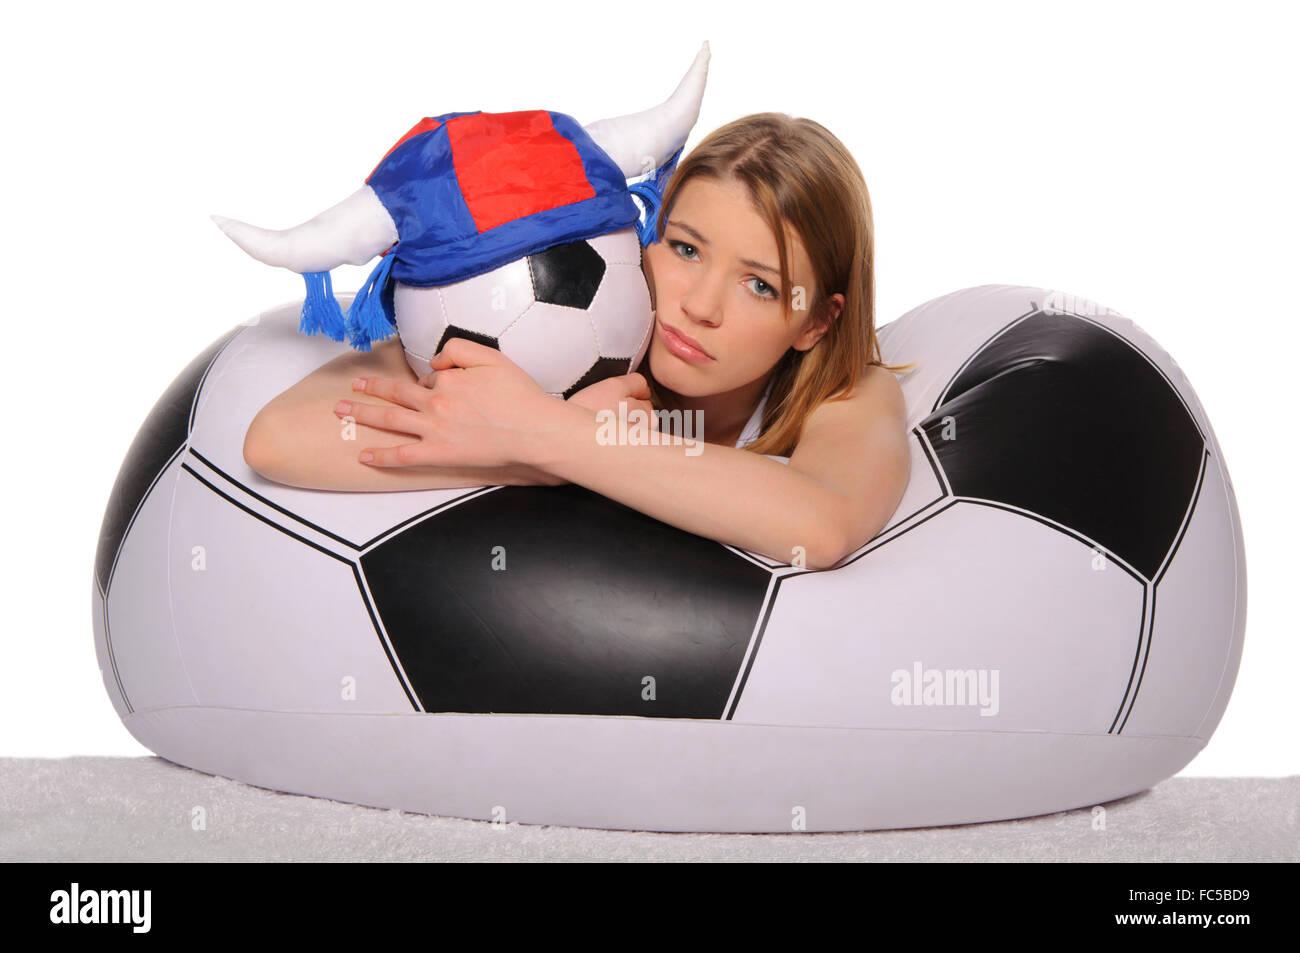 Animadora de fútbol angustiado con bola Foto de stock